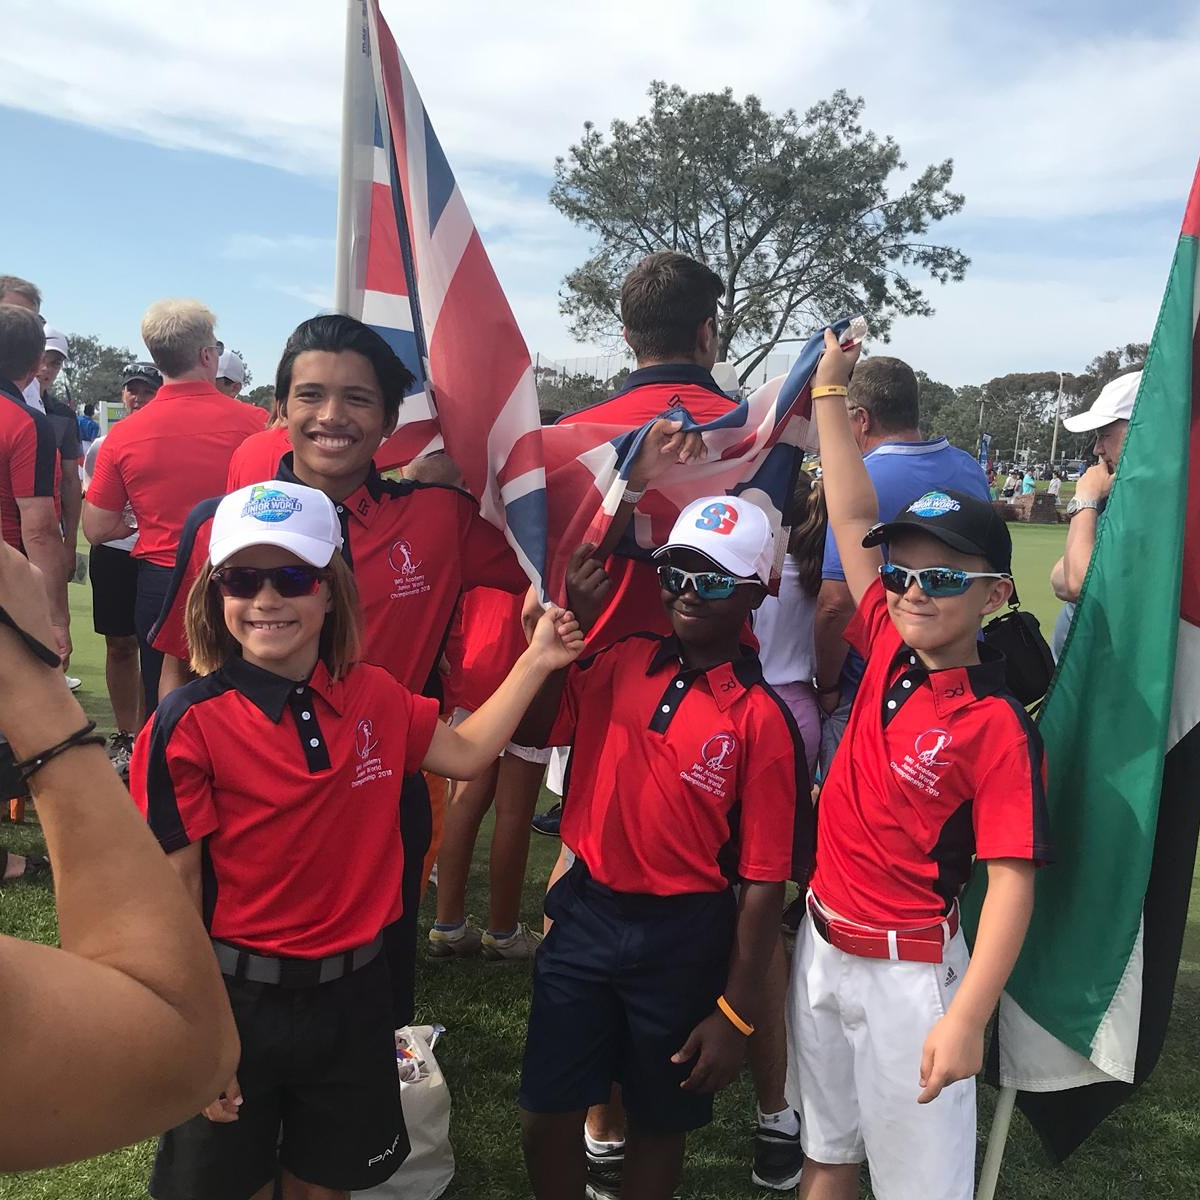 2018 BJGT team representing the UK at IMG Academy Junior World Championships